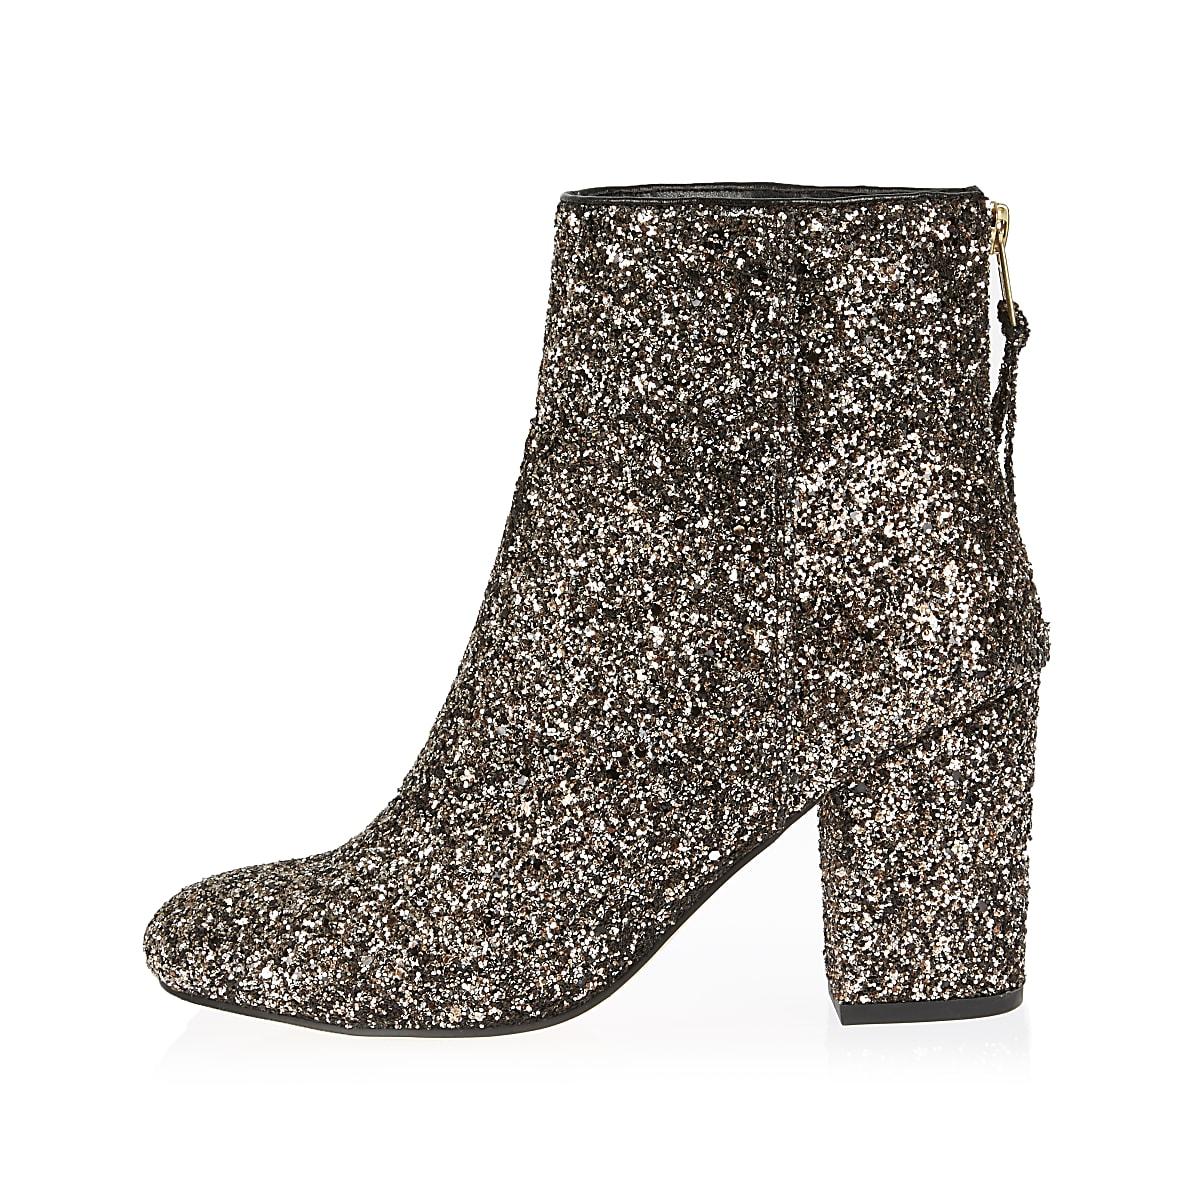 Gold glitter block heel ankle boots